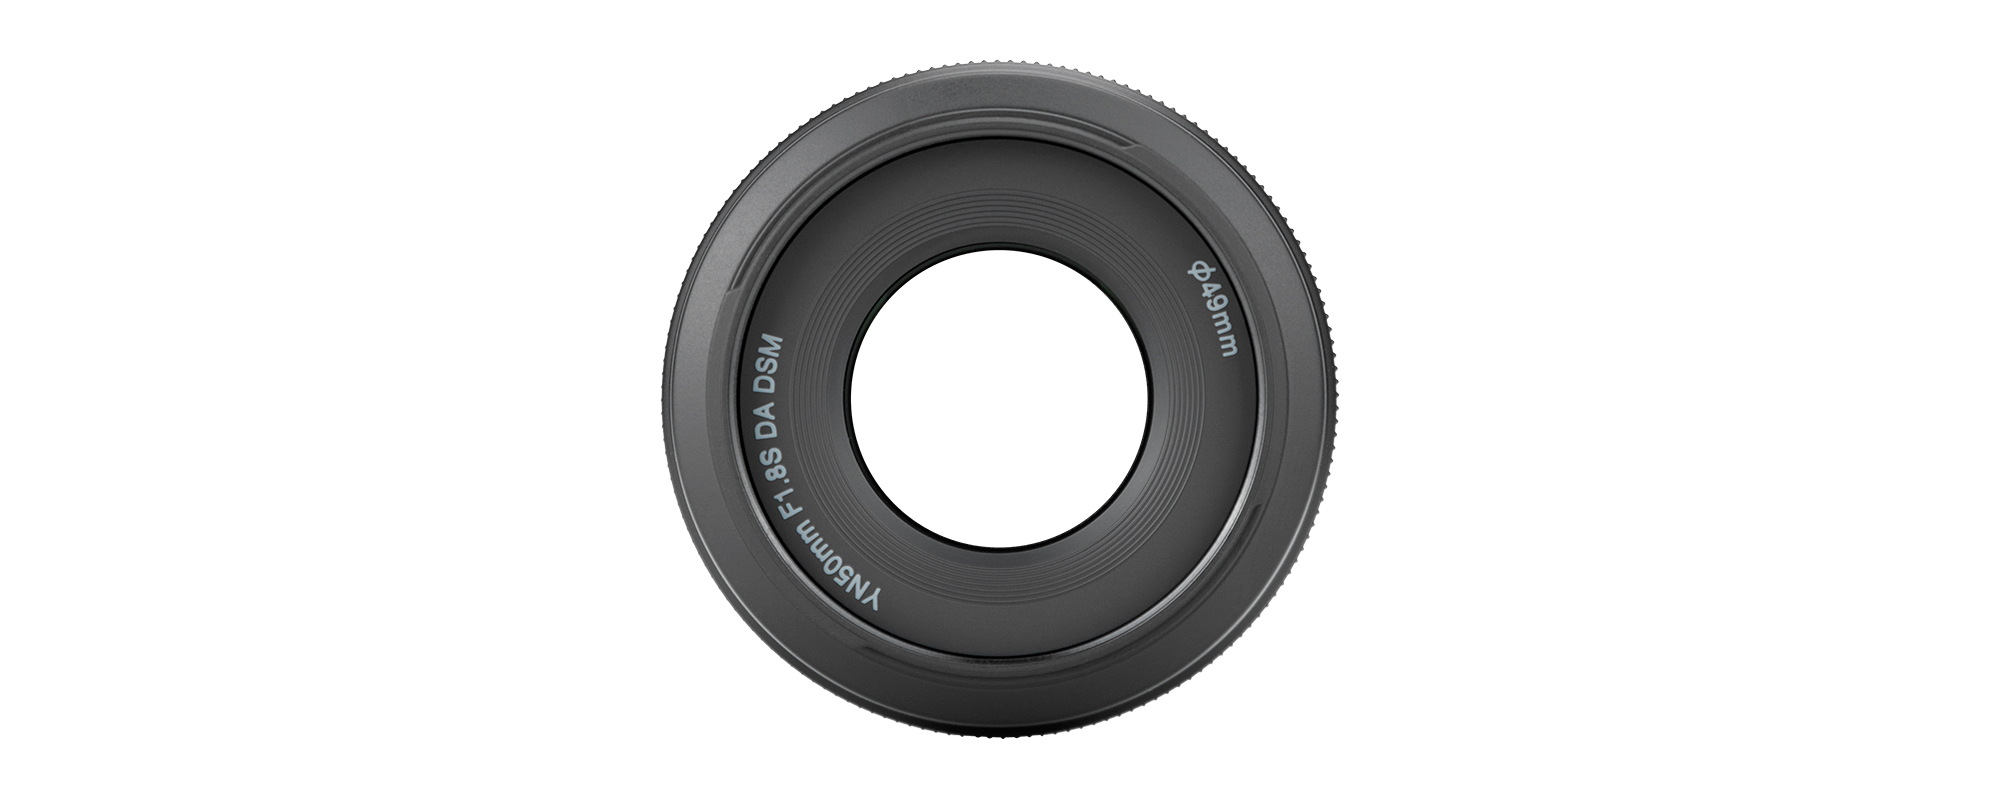 Obiektyw Yongnuo YN 50 mm f/1,8 do Sony E widok z góry